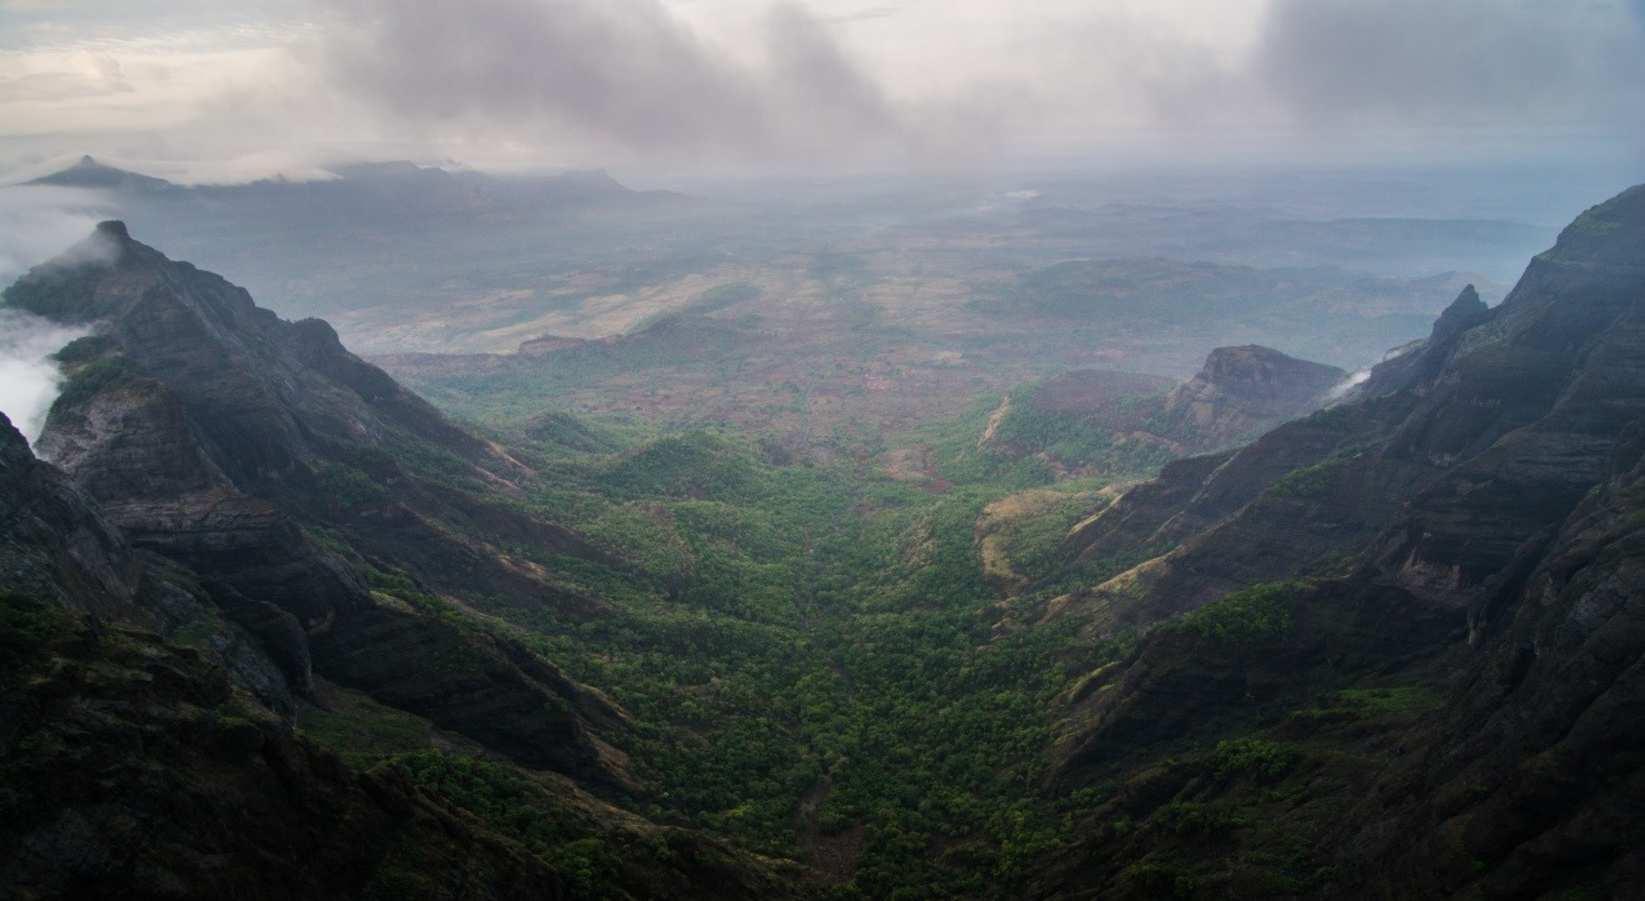 Take a Hike: A Trekking Guide for Beginners & Experts Near Mumbai